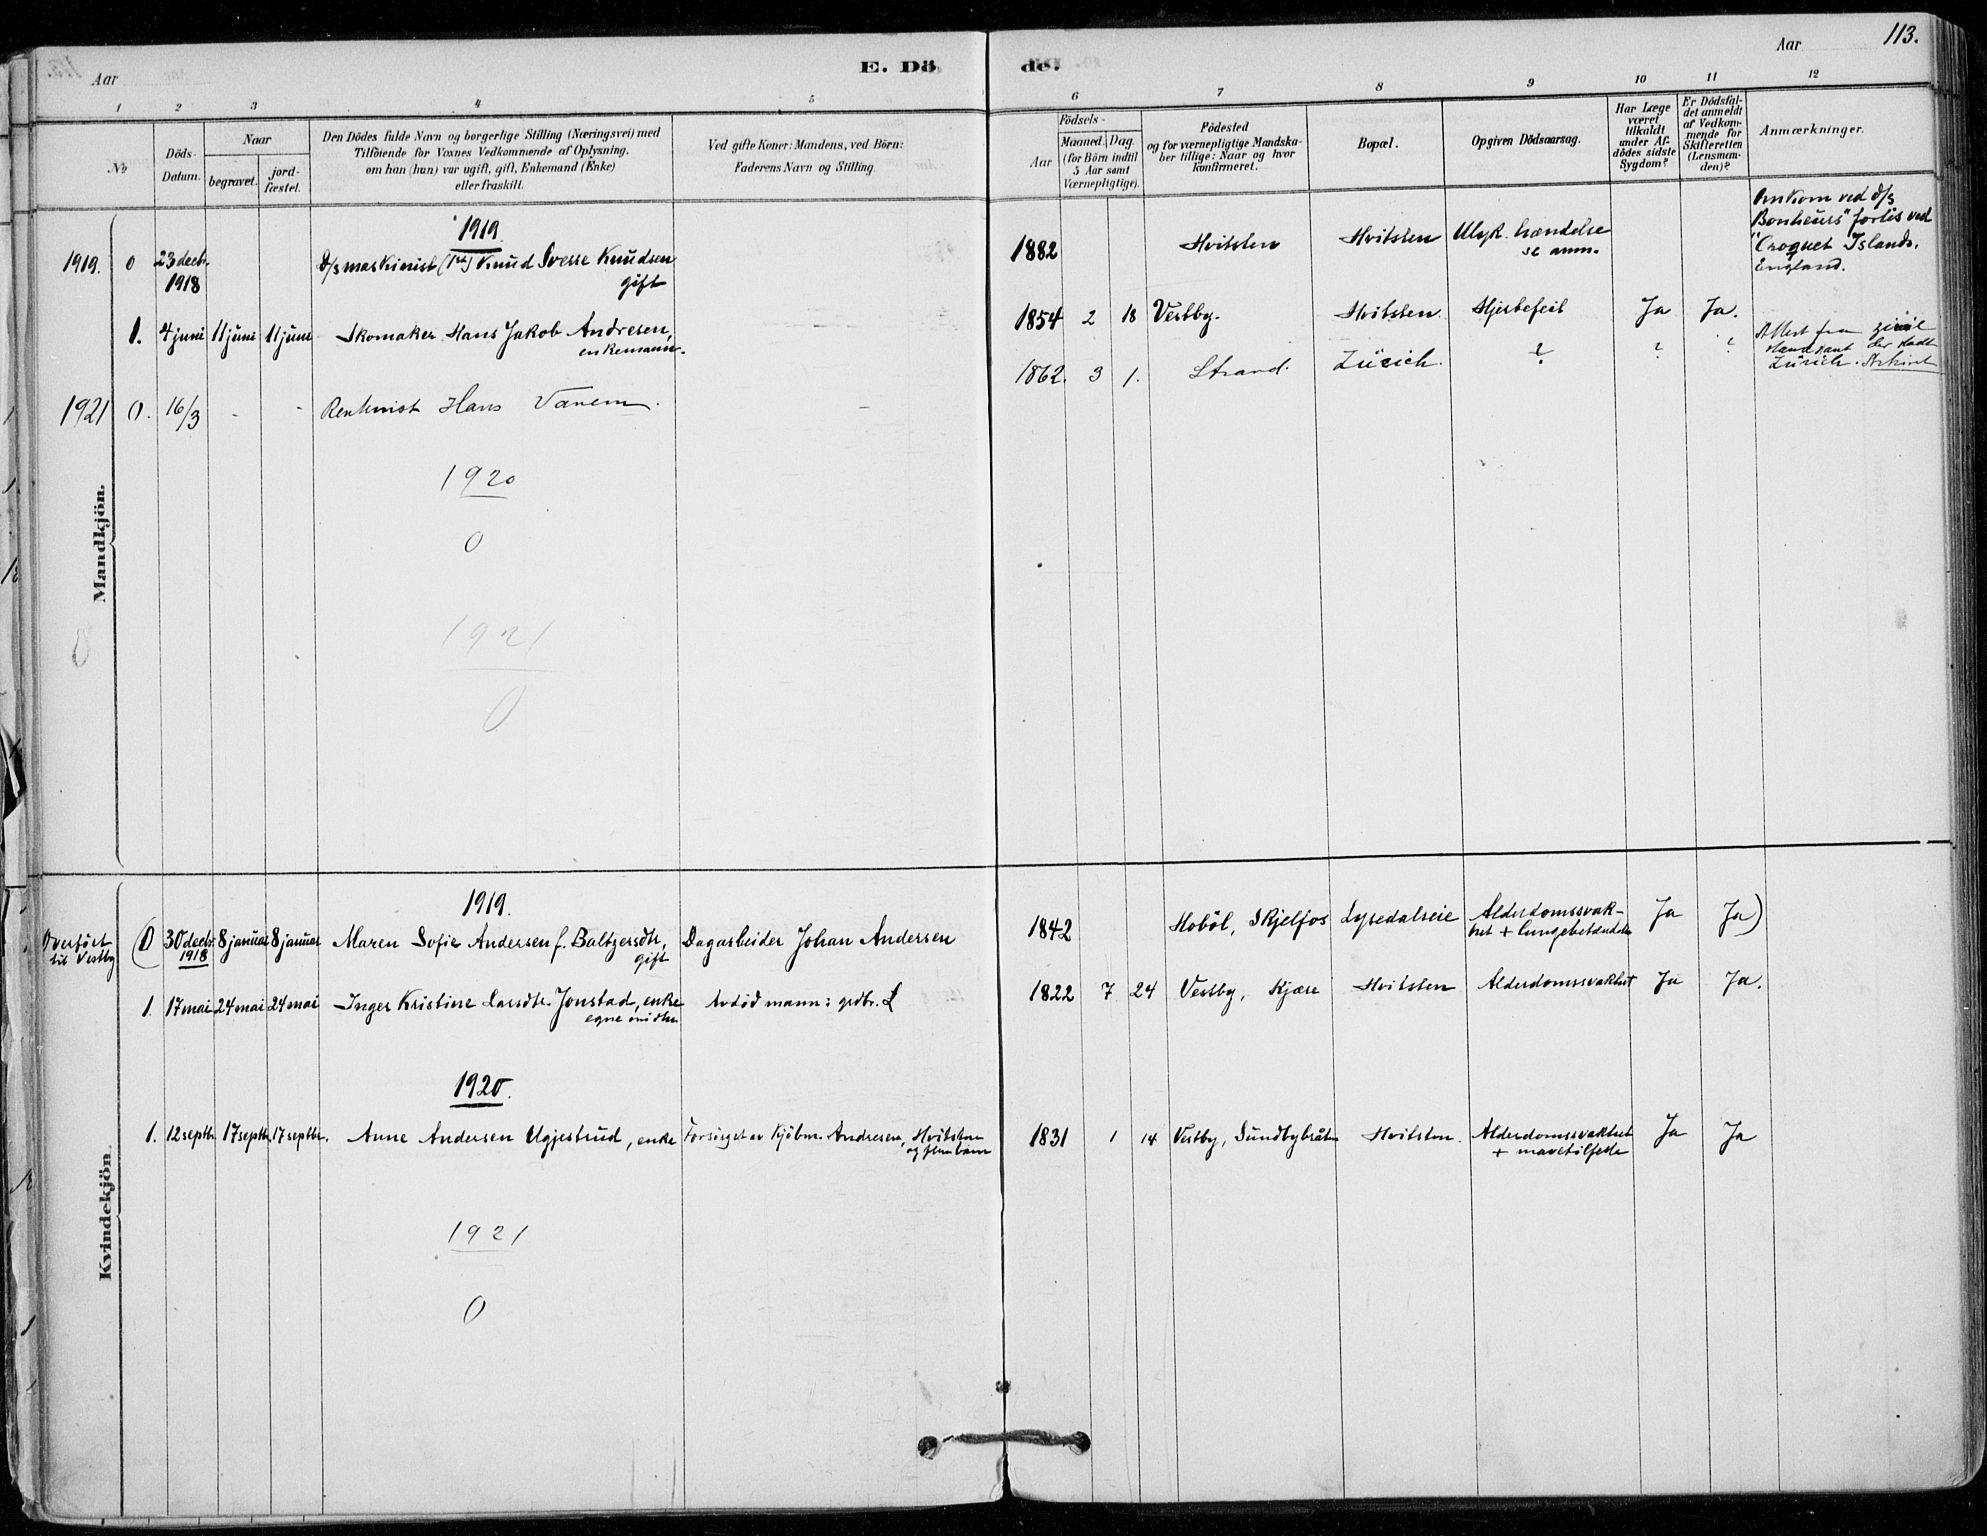 SAO, Vestby prestekontor Kirkebøker, F/Fd/L0001: Ministerialbok nr. IV 1, 1878-1945, s. 113